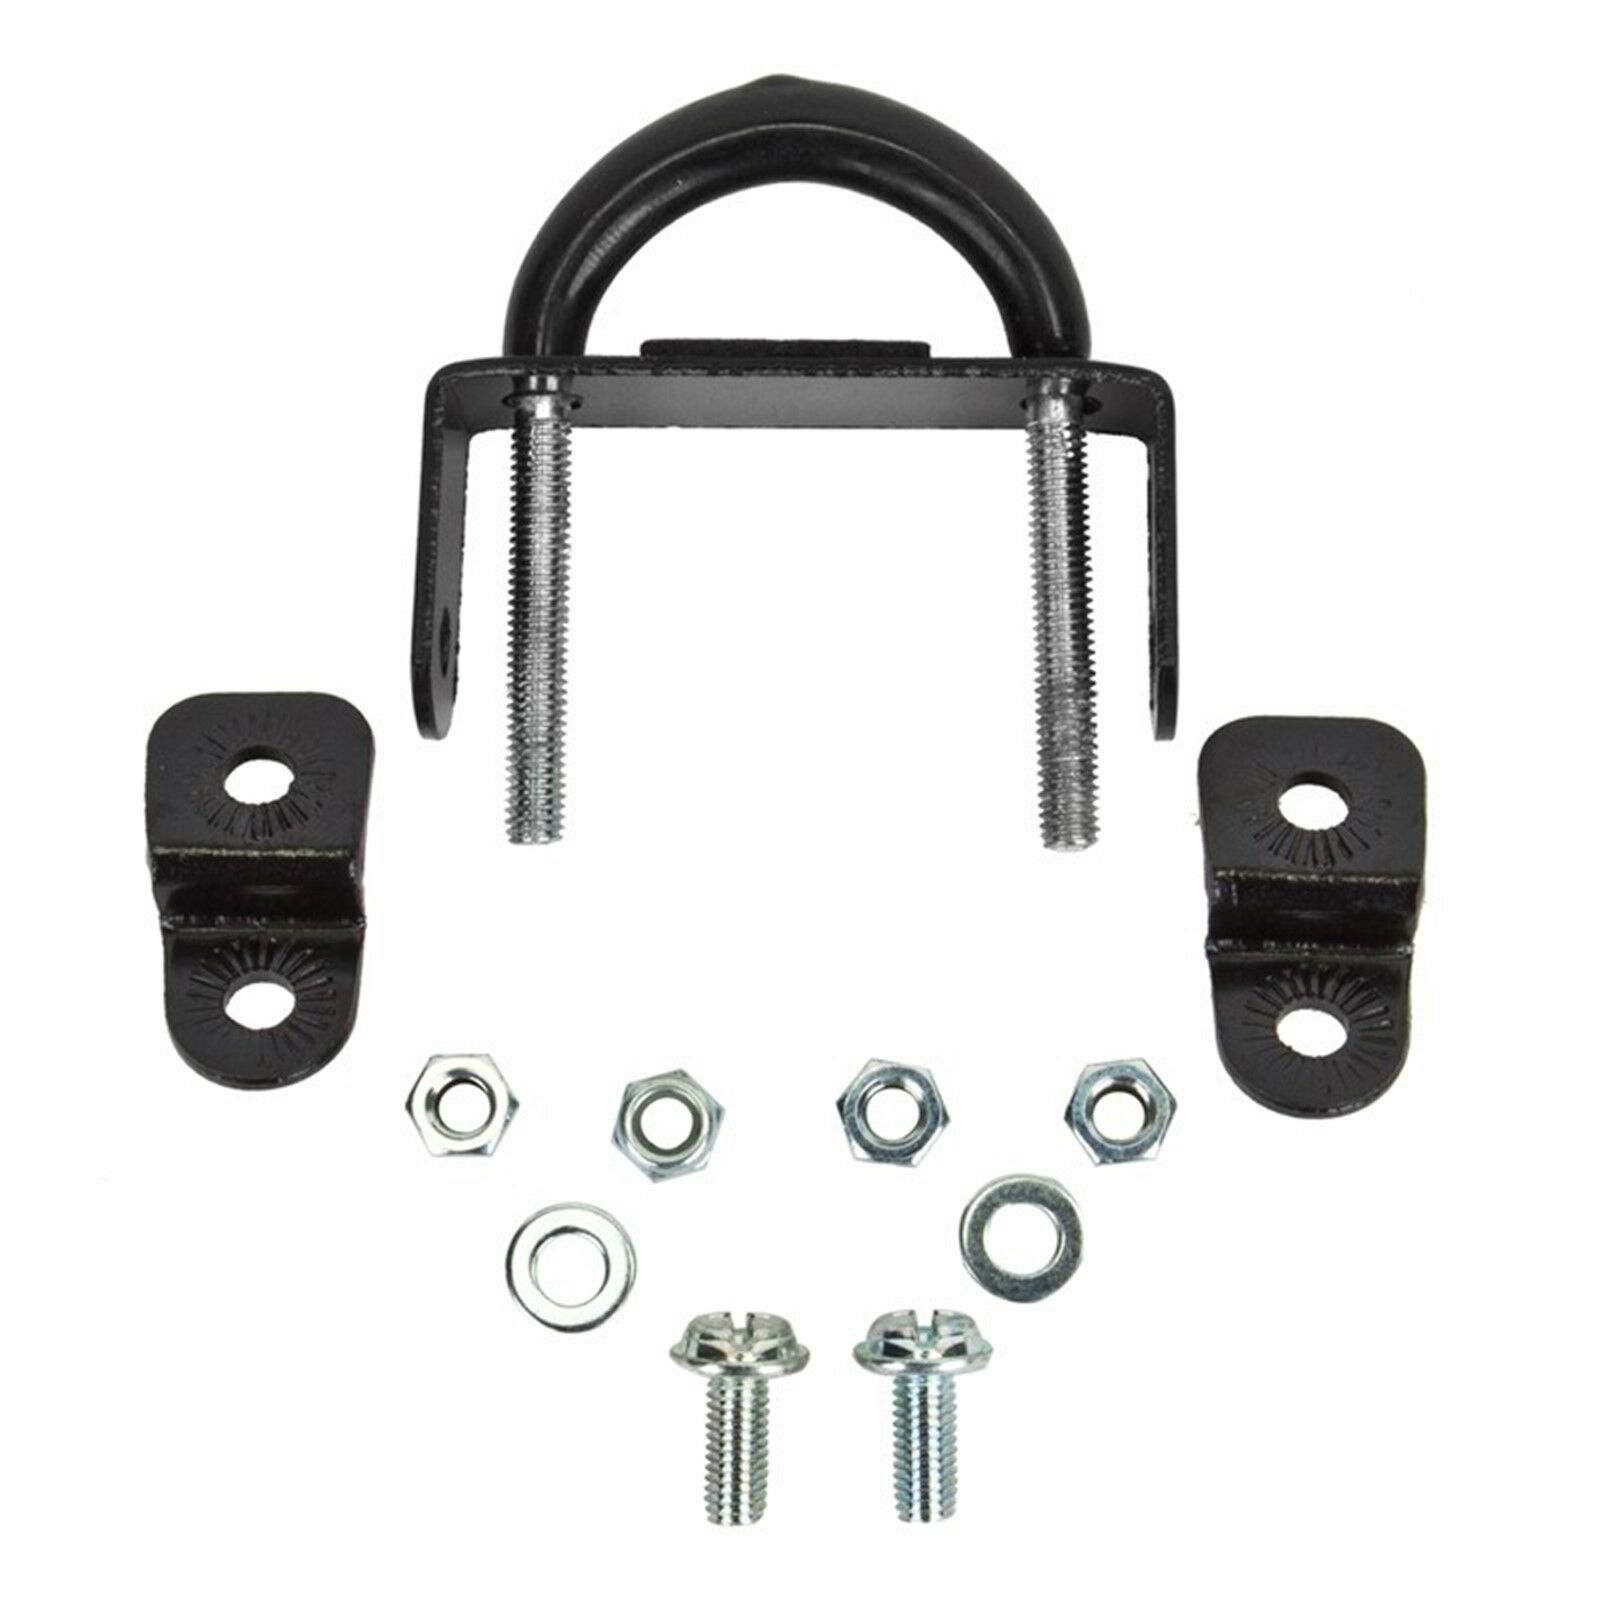 "Sunlite Rear Bicycle Rack Monostay Adapter Mount 1-1//8/"" Tubing Bike Cycling"